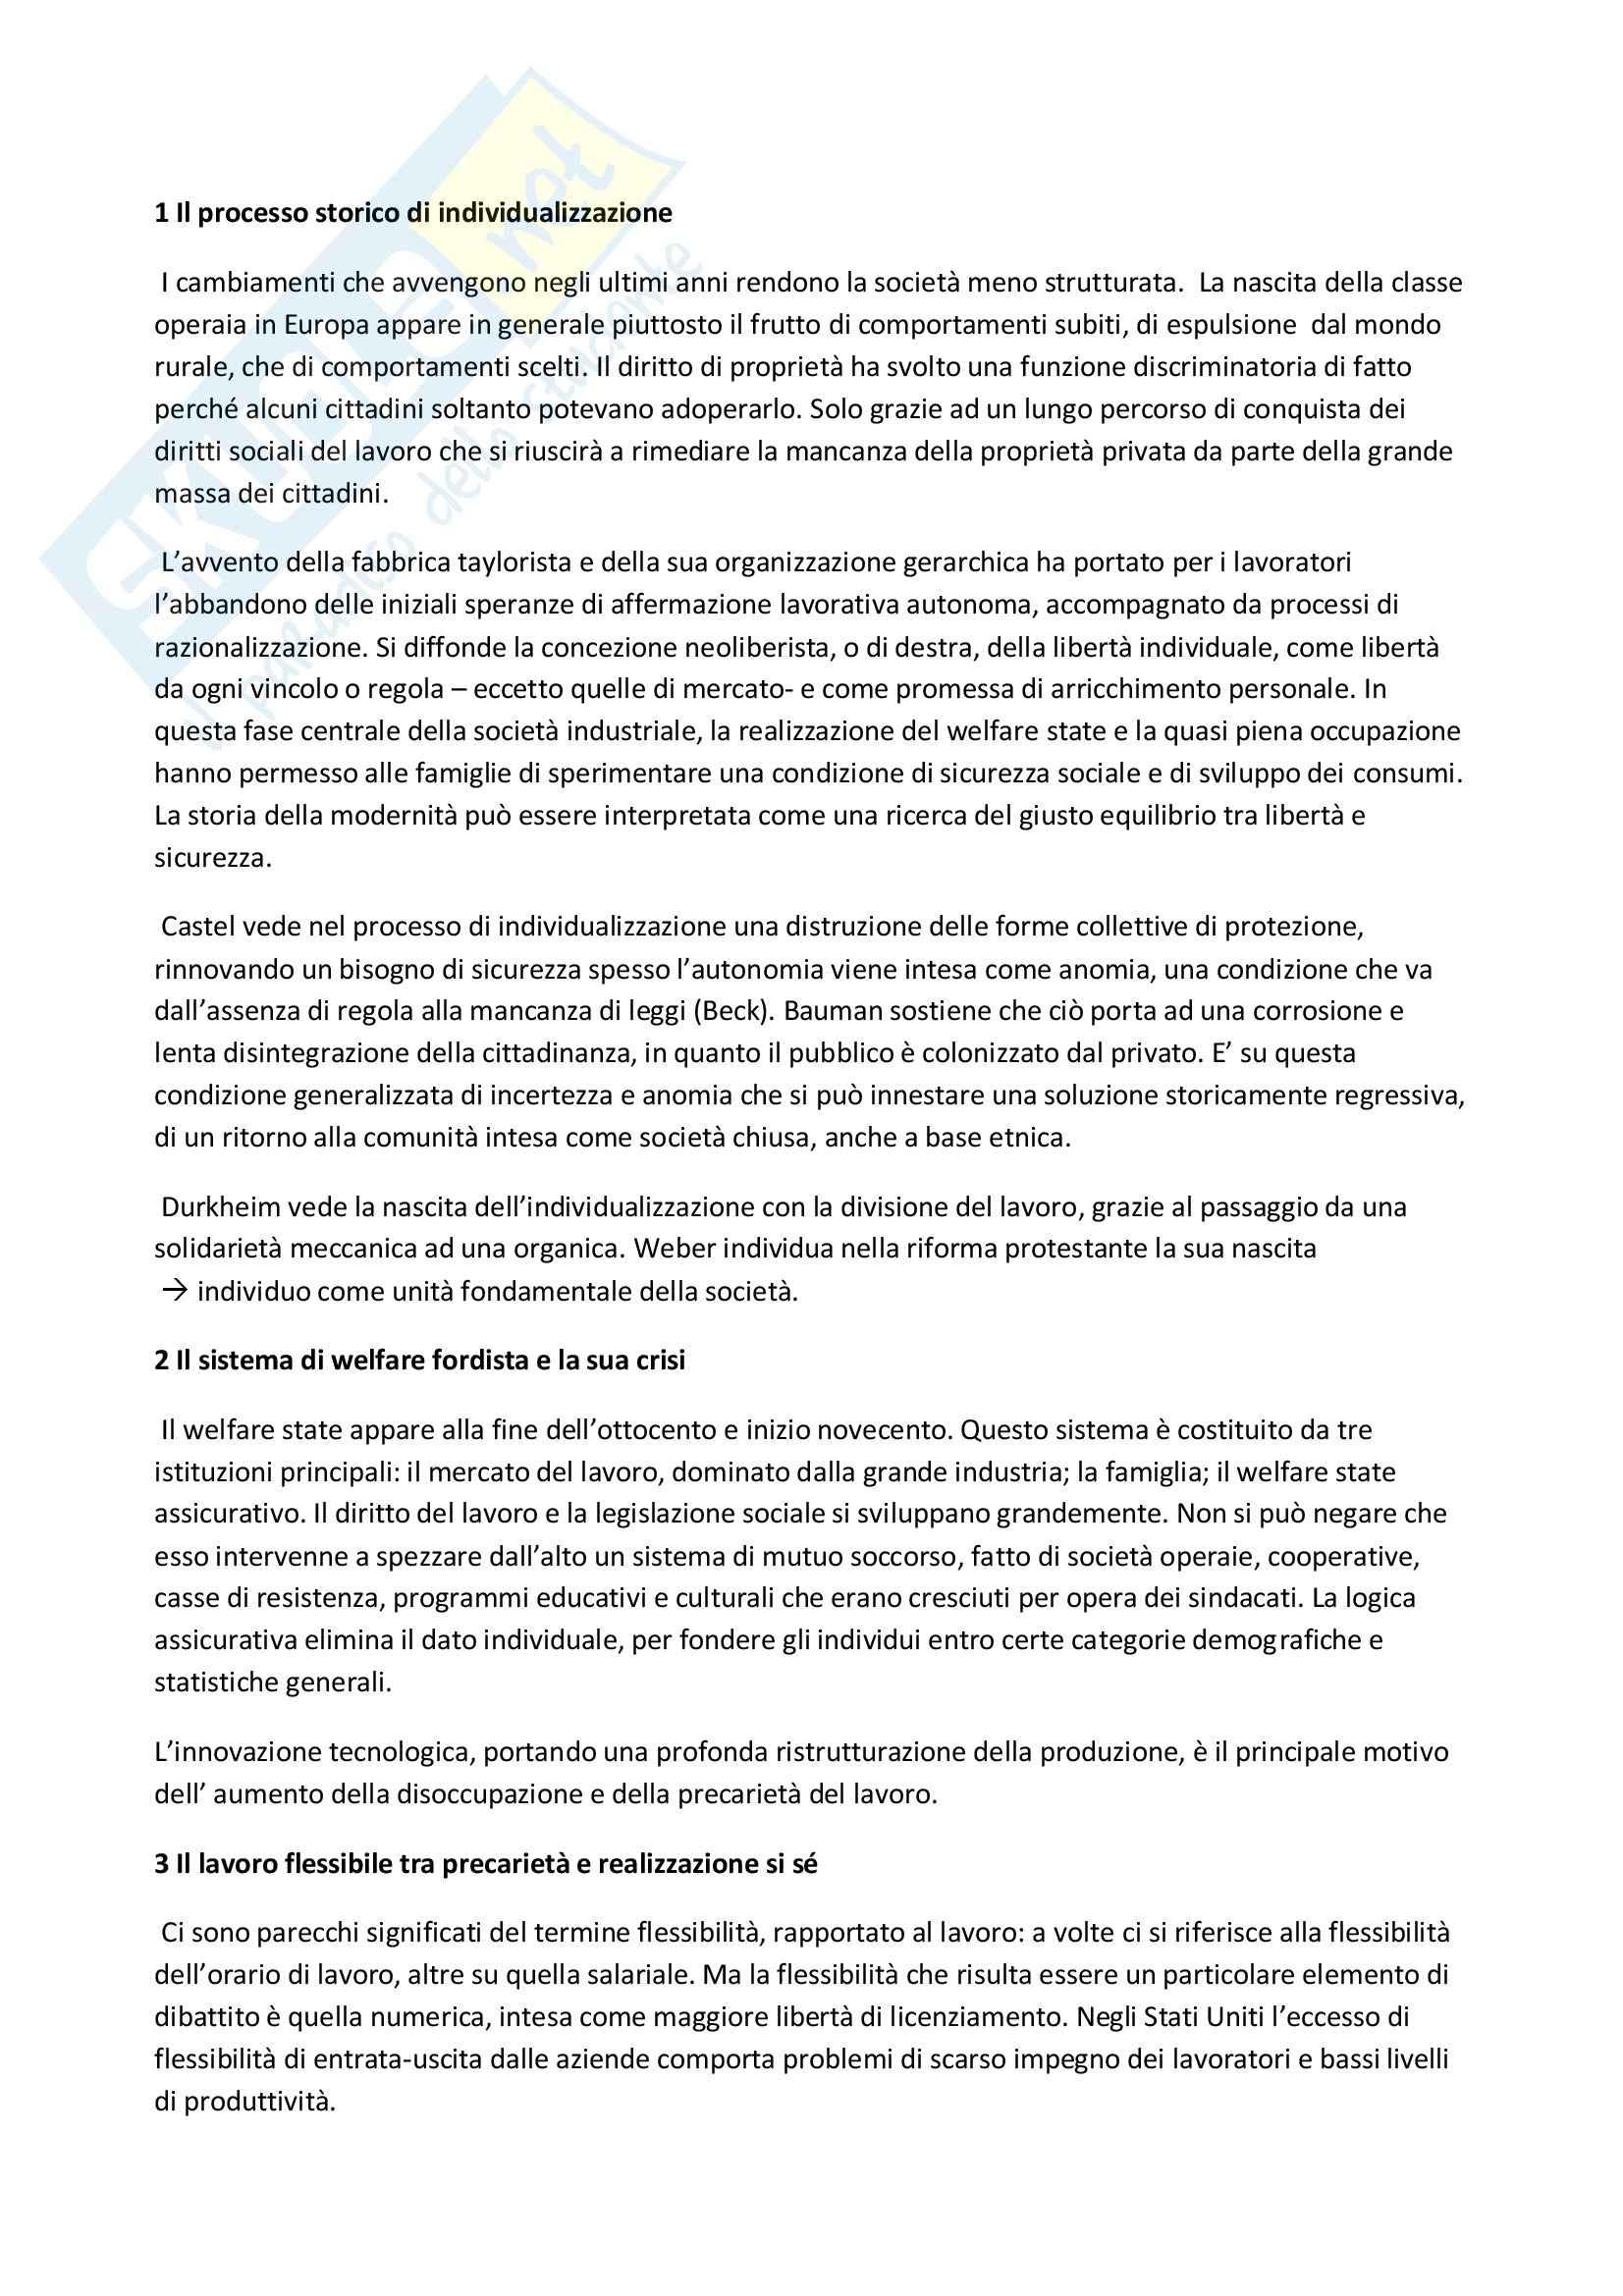 Riassunto esame Nuovi lavori, nuovo welfare, Paci, prof. Calza